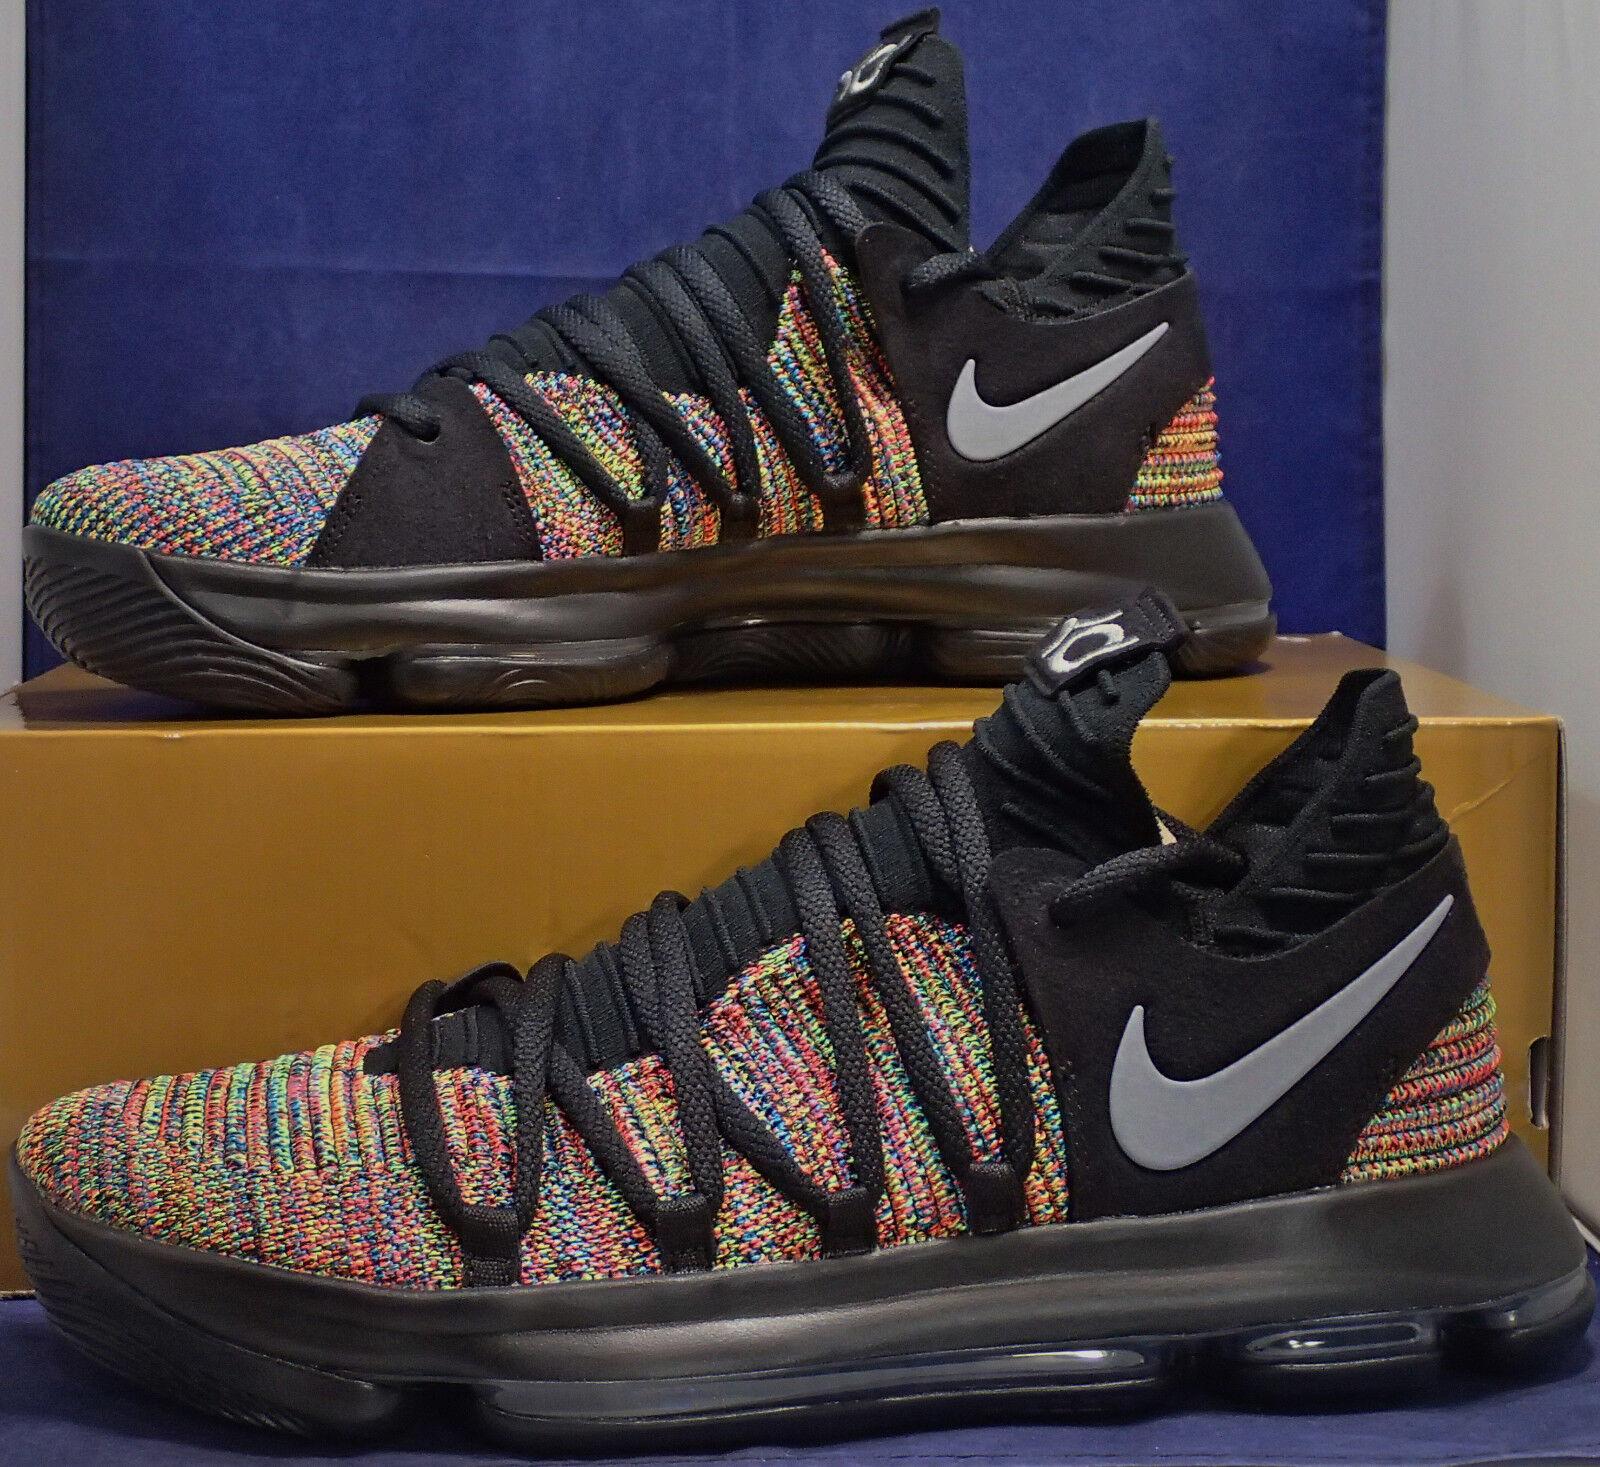 Nike zoom kd 10 x schwarz farbe kevin sz durant sz kevin - 10 (av4899-010) a43913